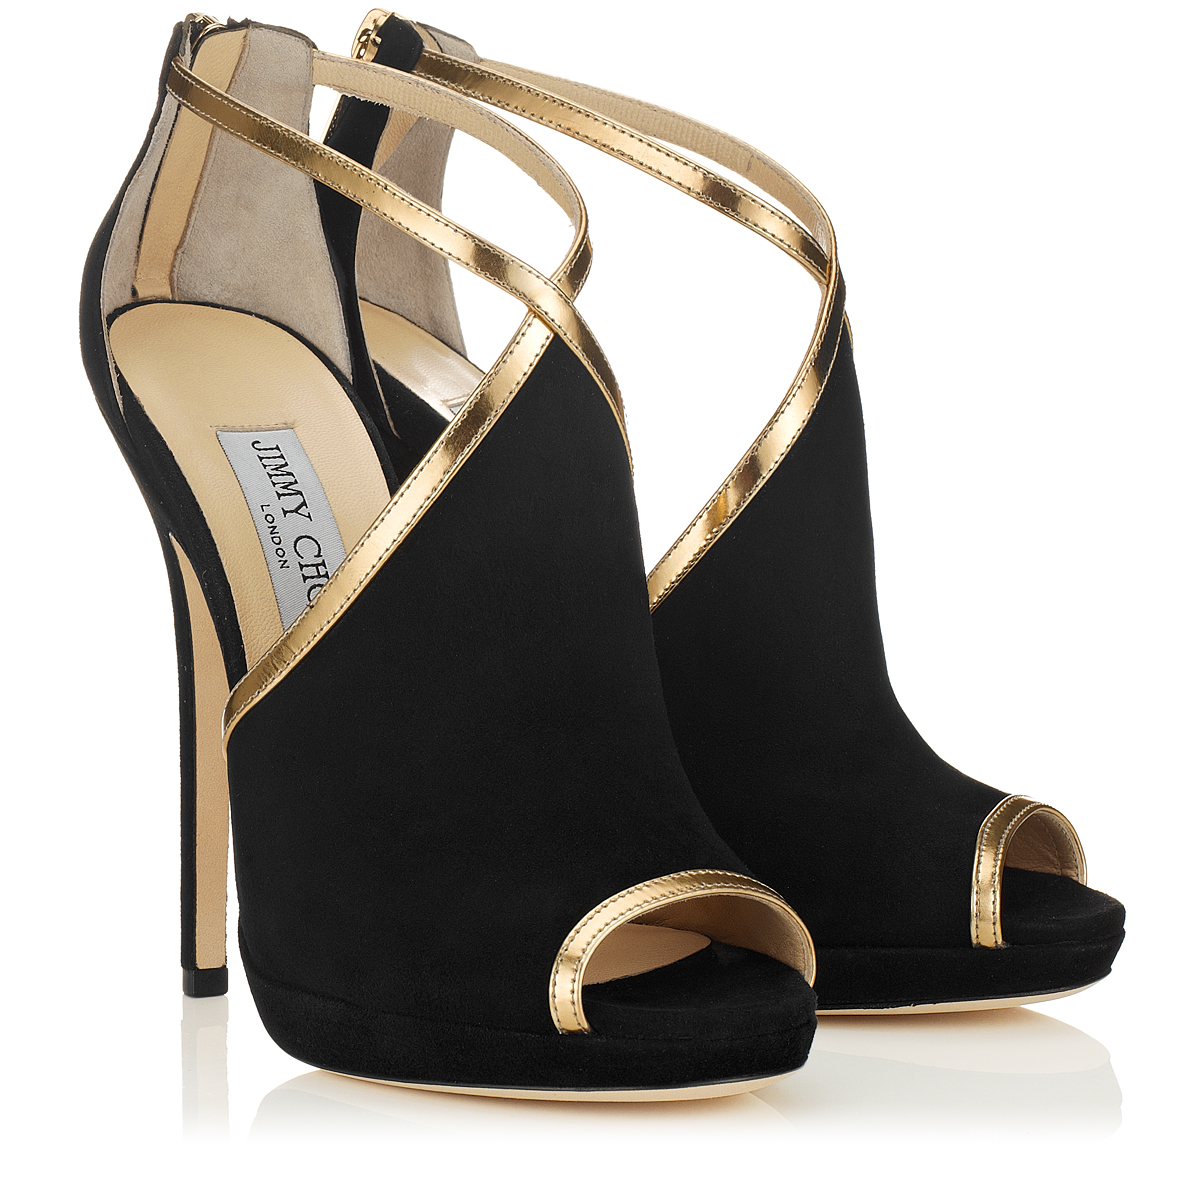 463556ce68e Jimmy Choo Fey High Heeled Shoes in Black - Lyst